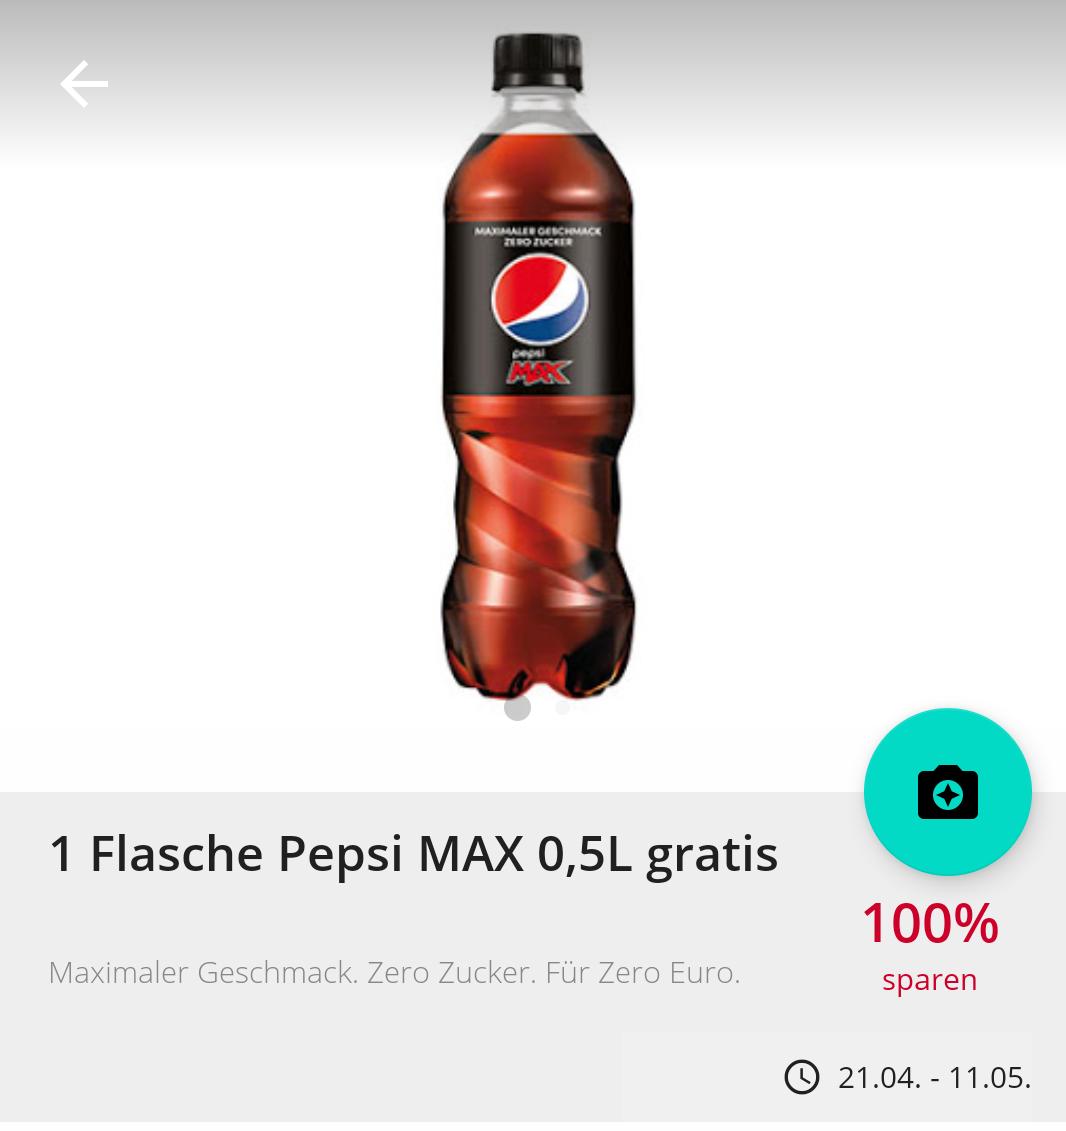 [GzG] Pepsi Max 0,5l gratis [bundesweit] [Scondoo]